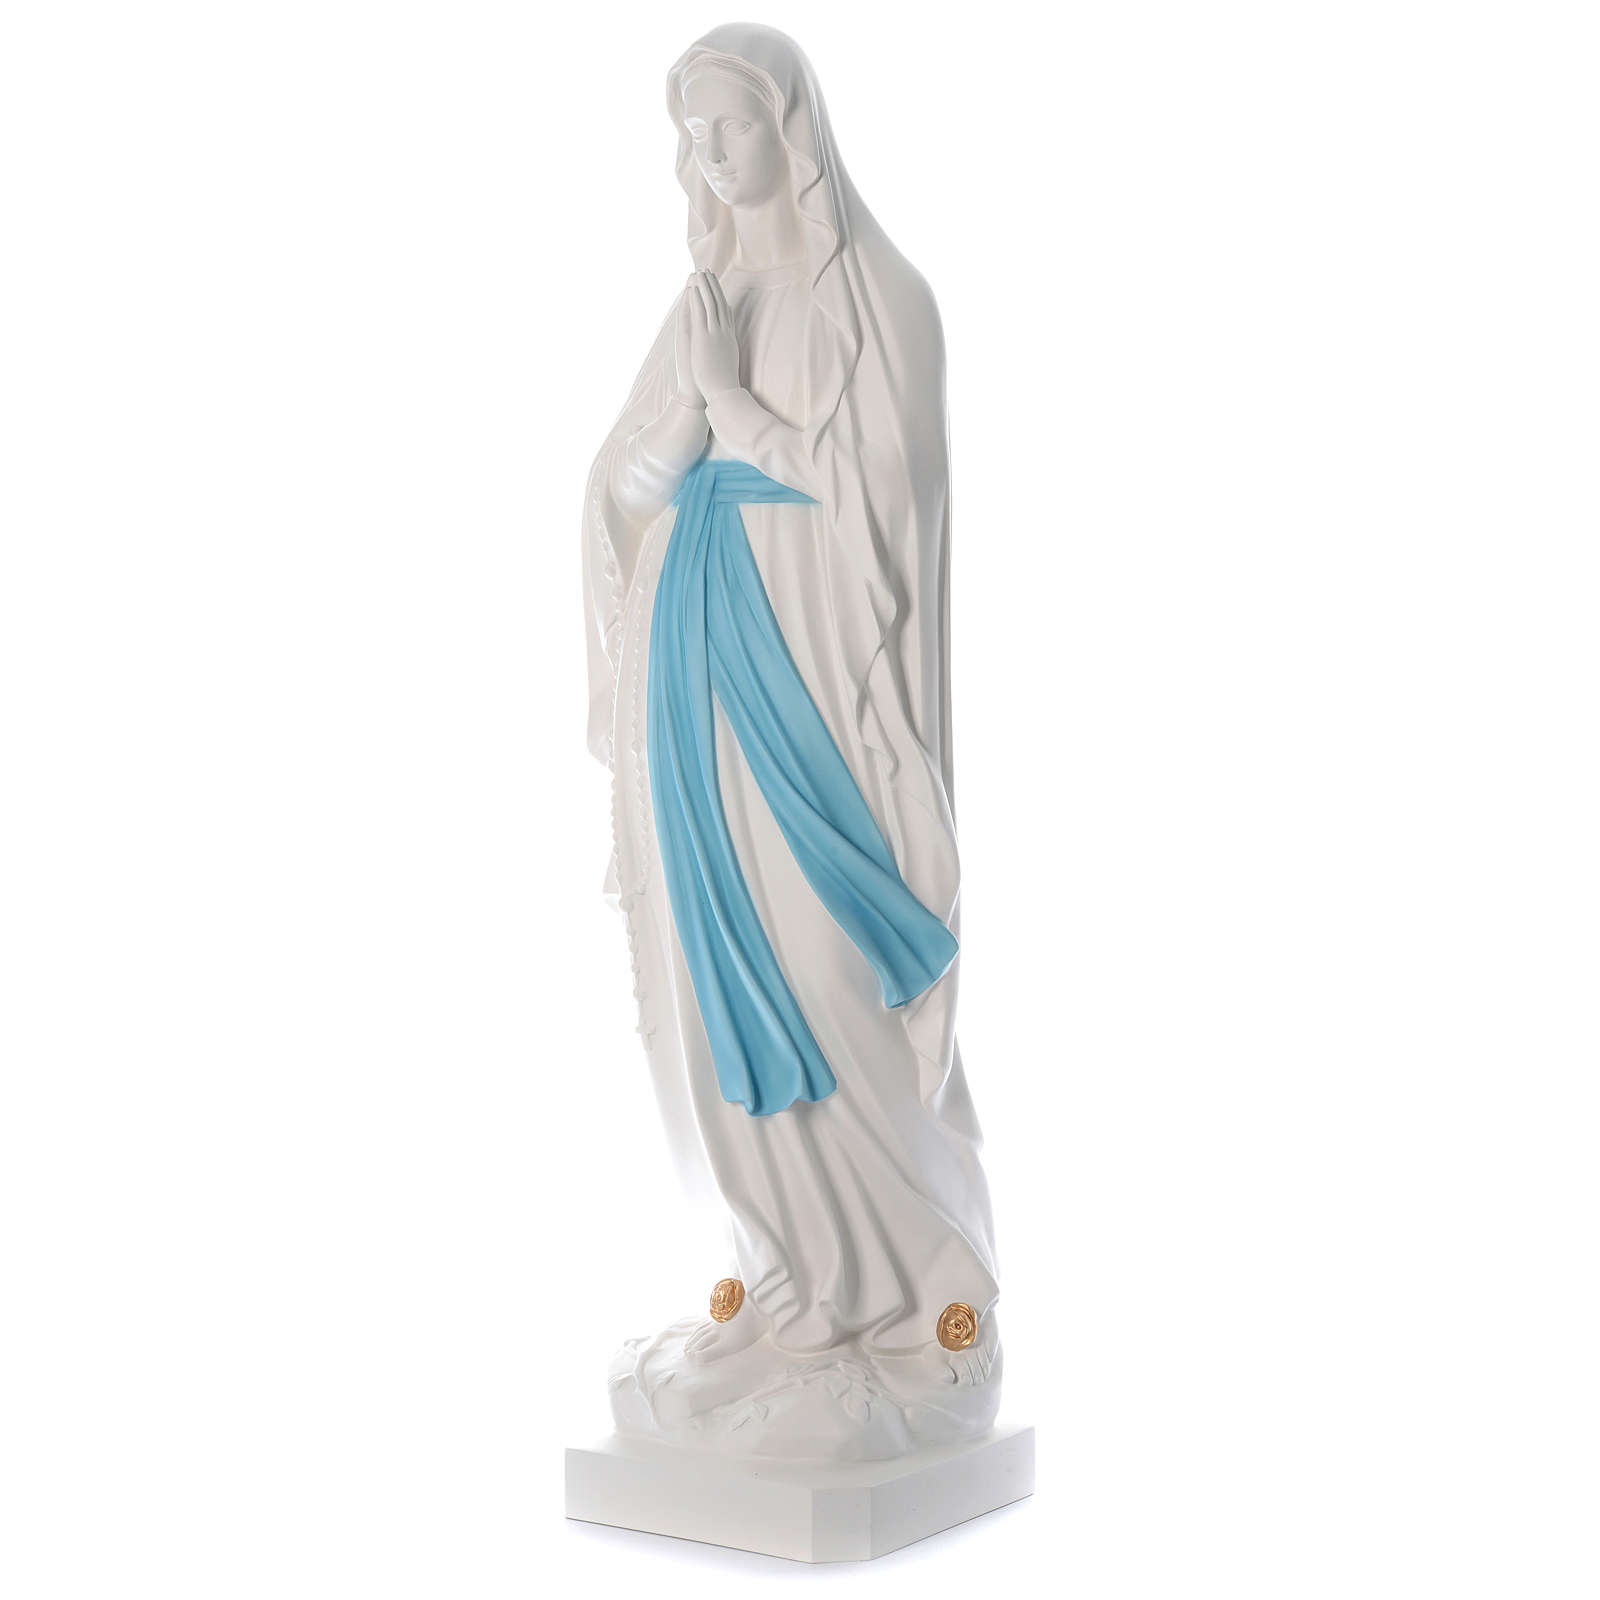 Statua Madonna di Lourdes 160 cm fiberglass colori originali PER ESTERNO 4